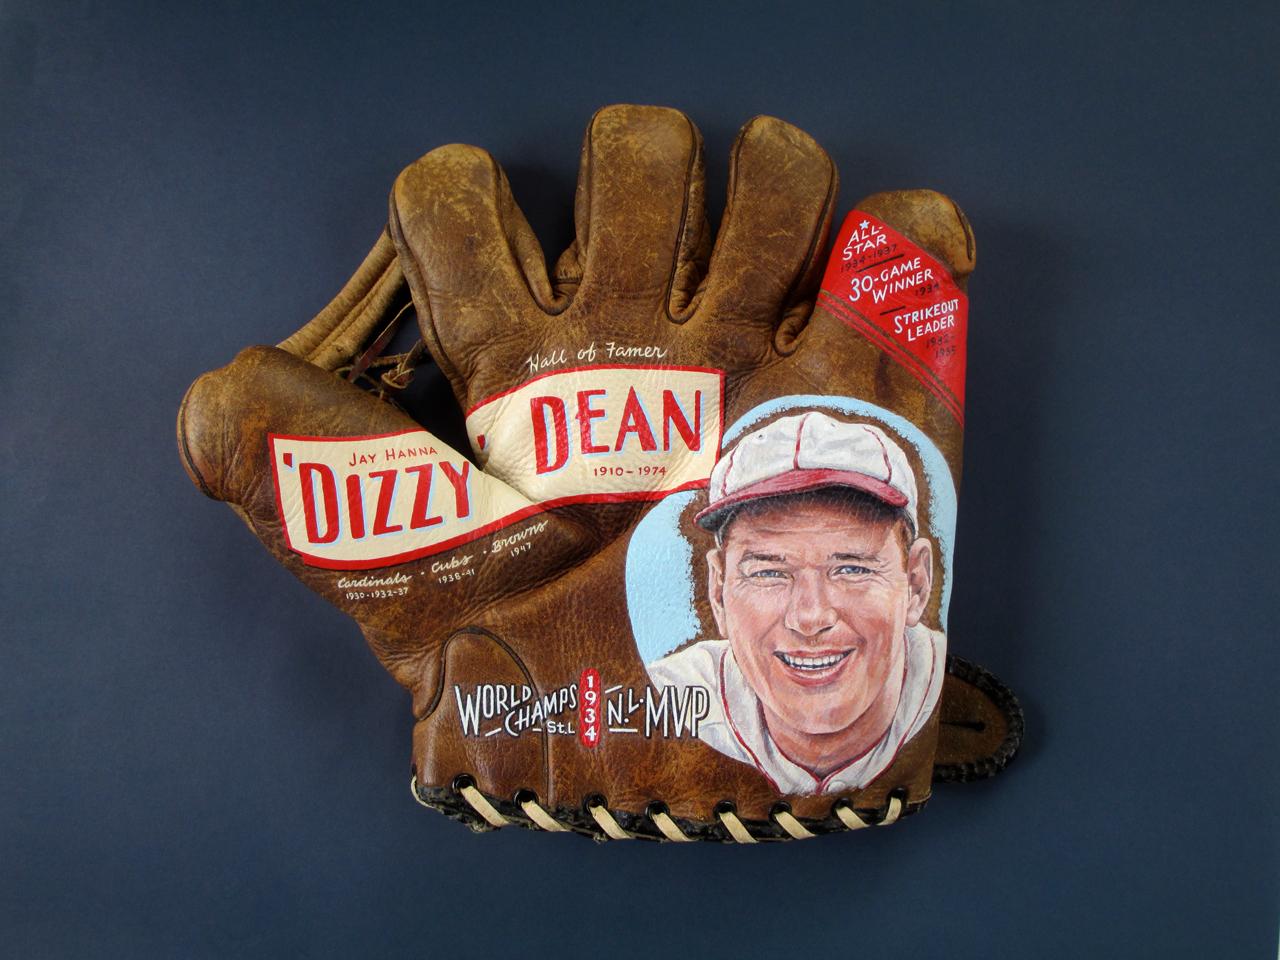 Dizzy Dean Glove Art